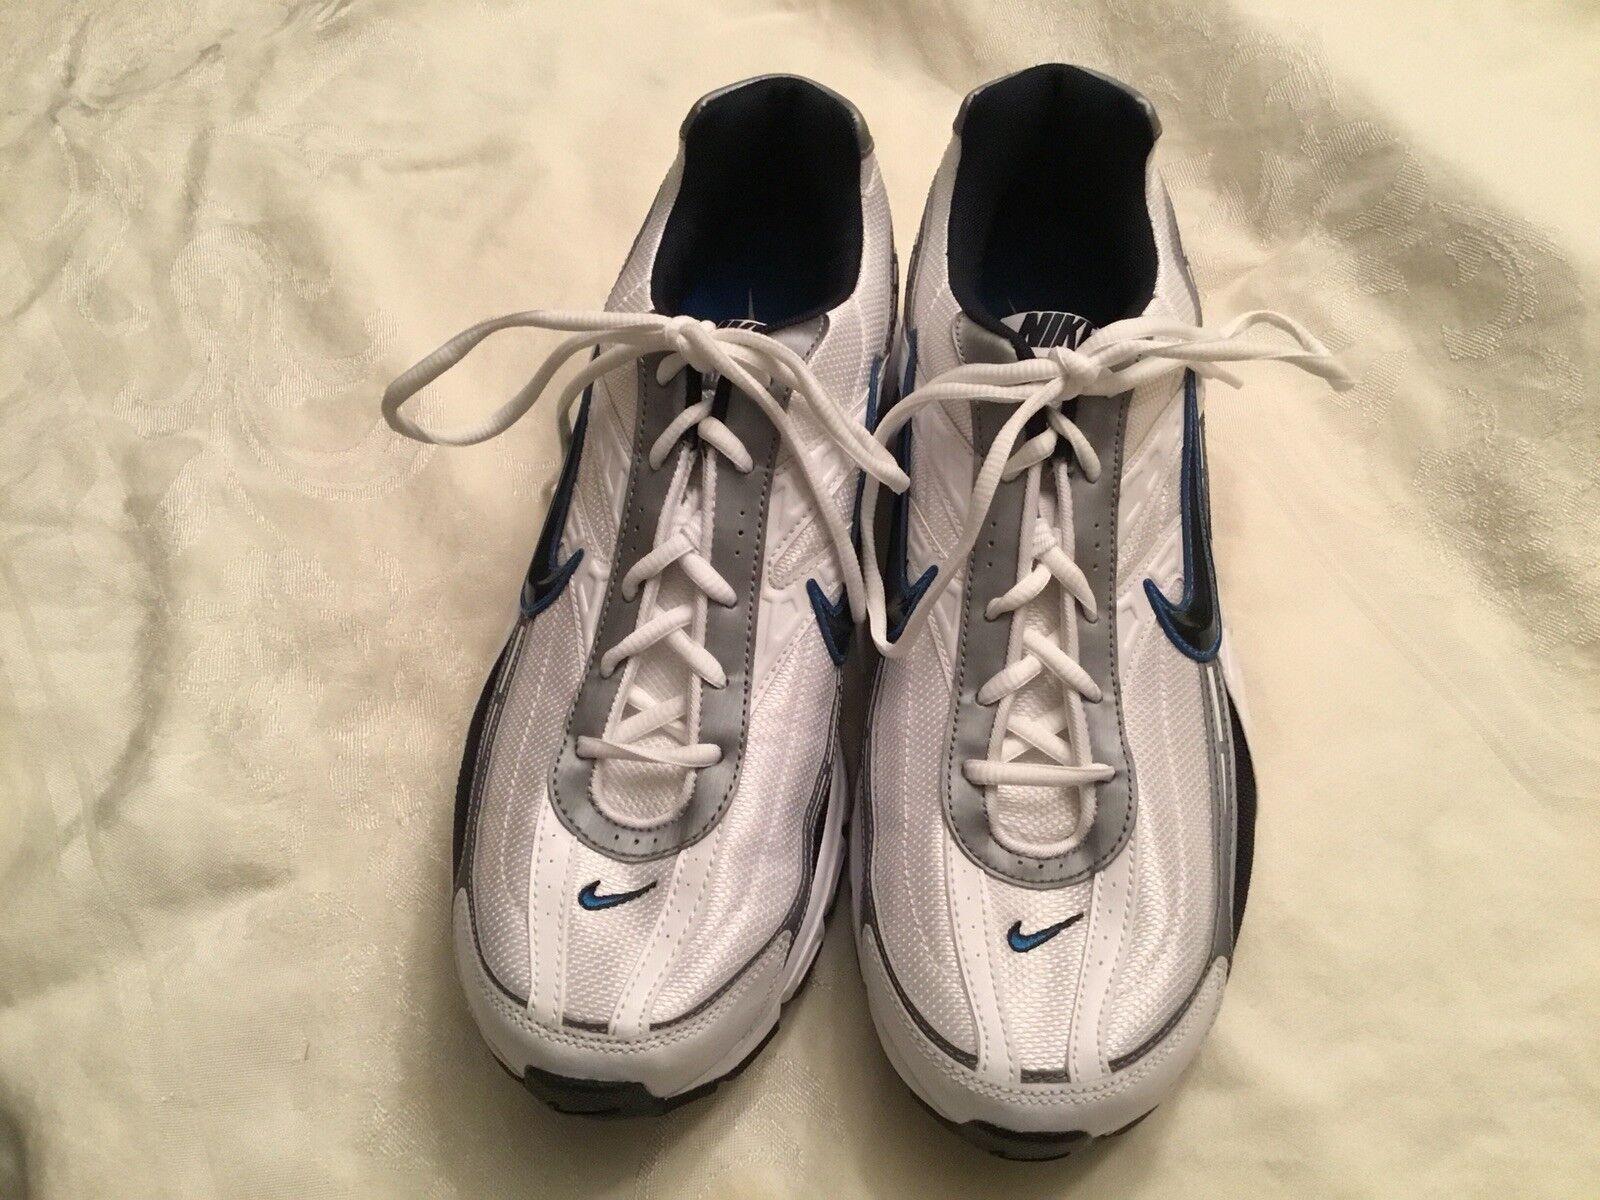 NWOB  NIKE INITIATOR Men's Running shoes White Size 12 BRAND NEW EC